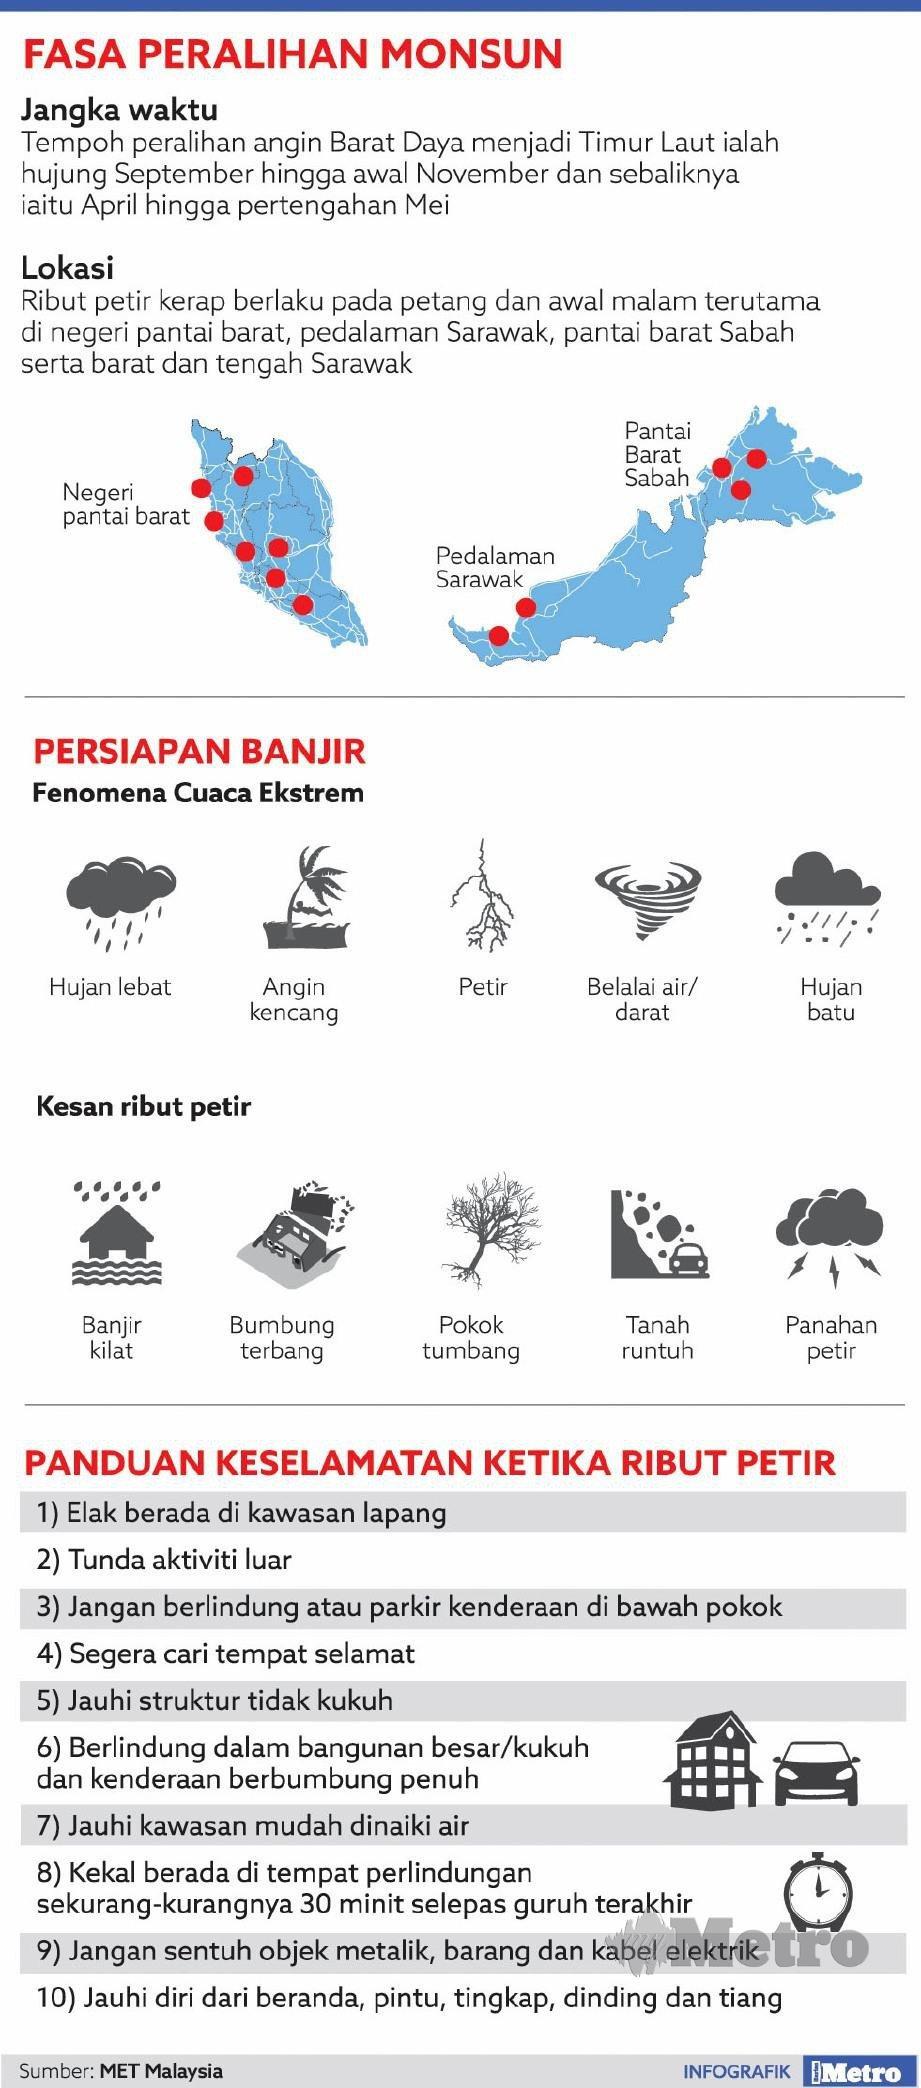 Ibnu Hasyim Pindah 596 Mangsa Banjir Di Johor Panduan